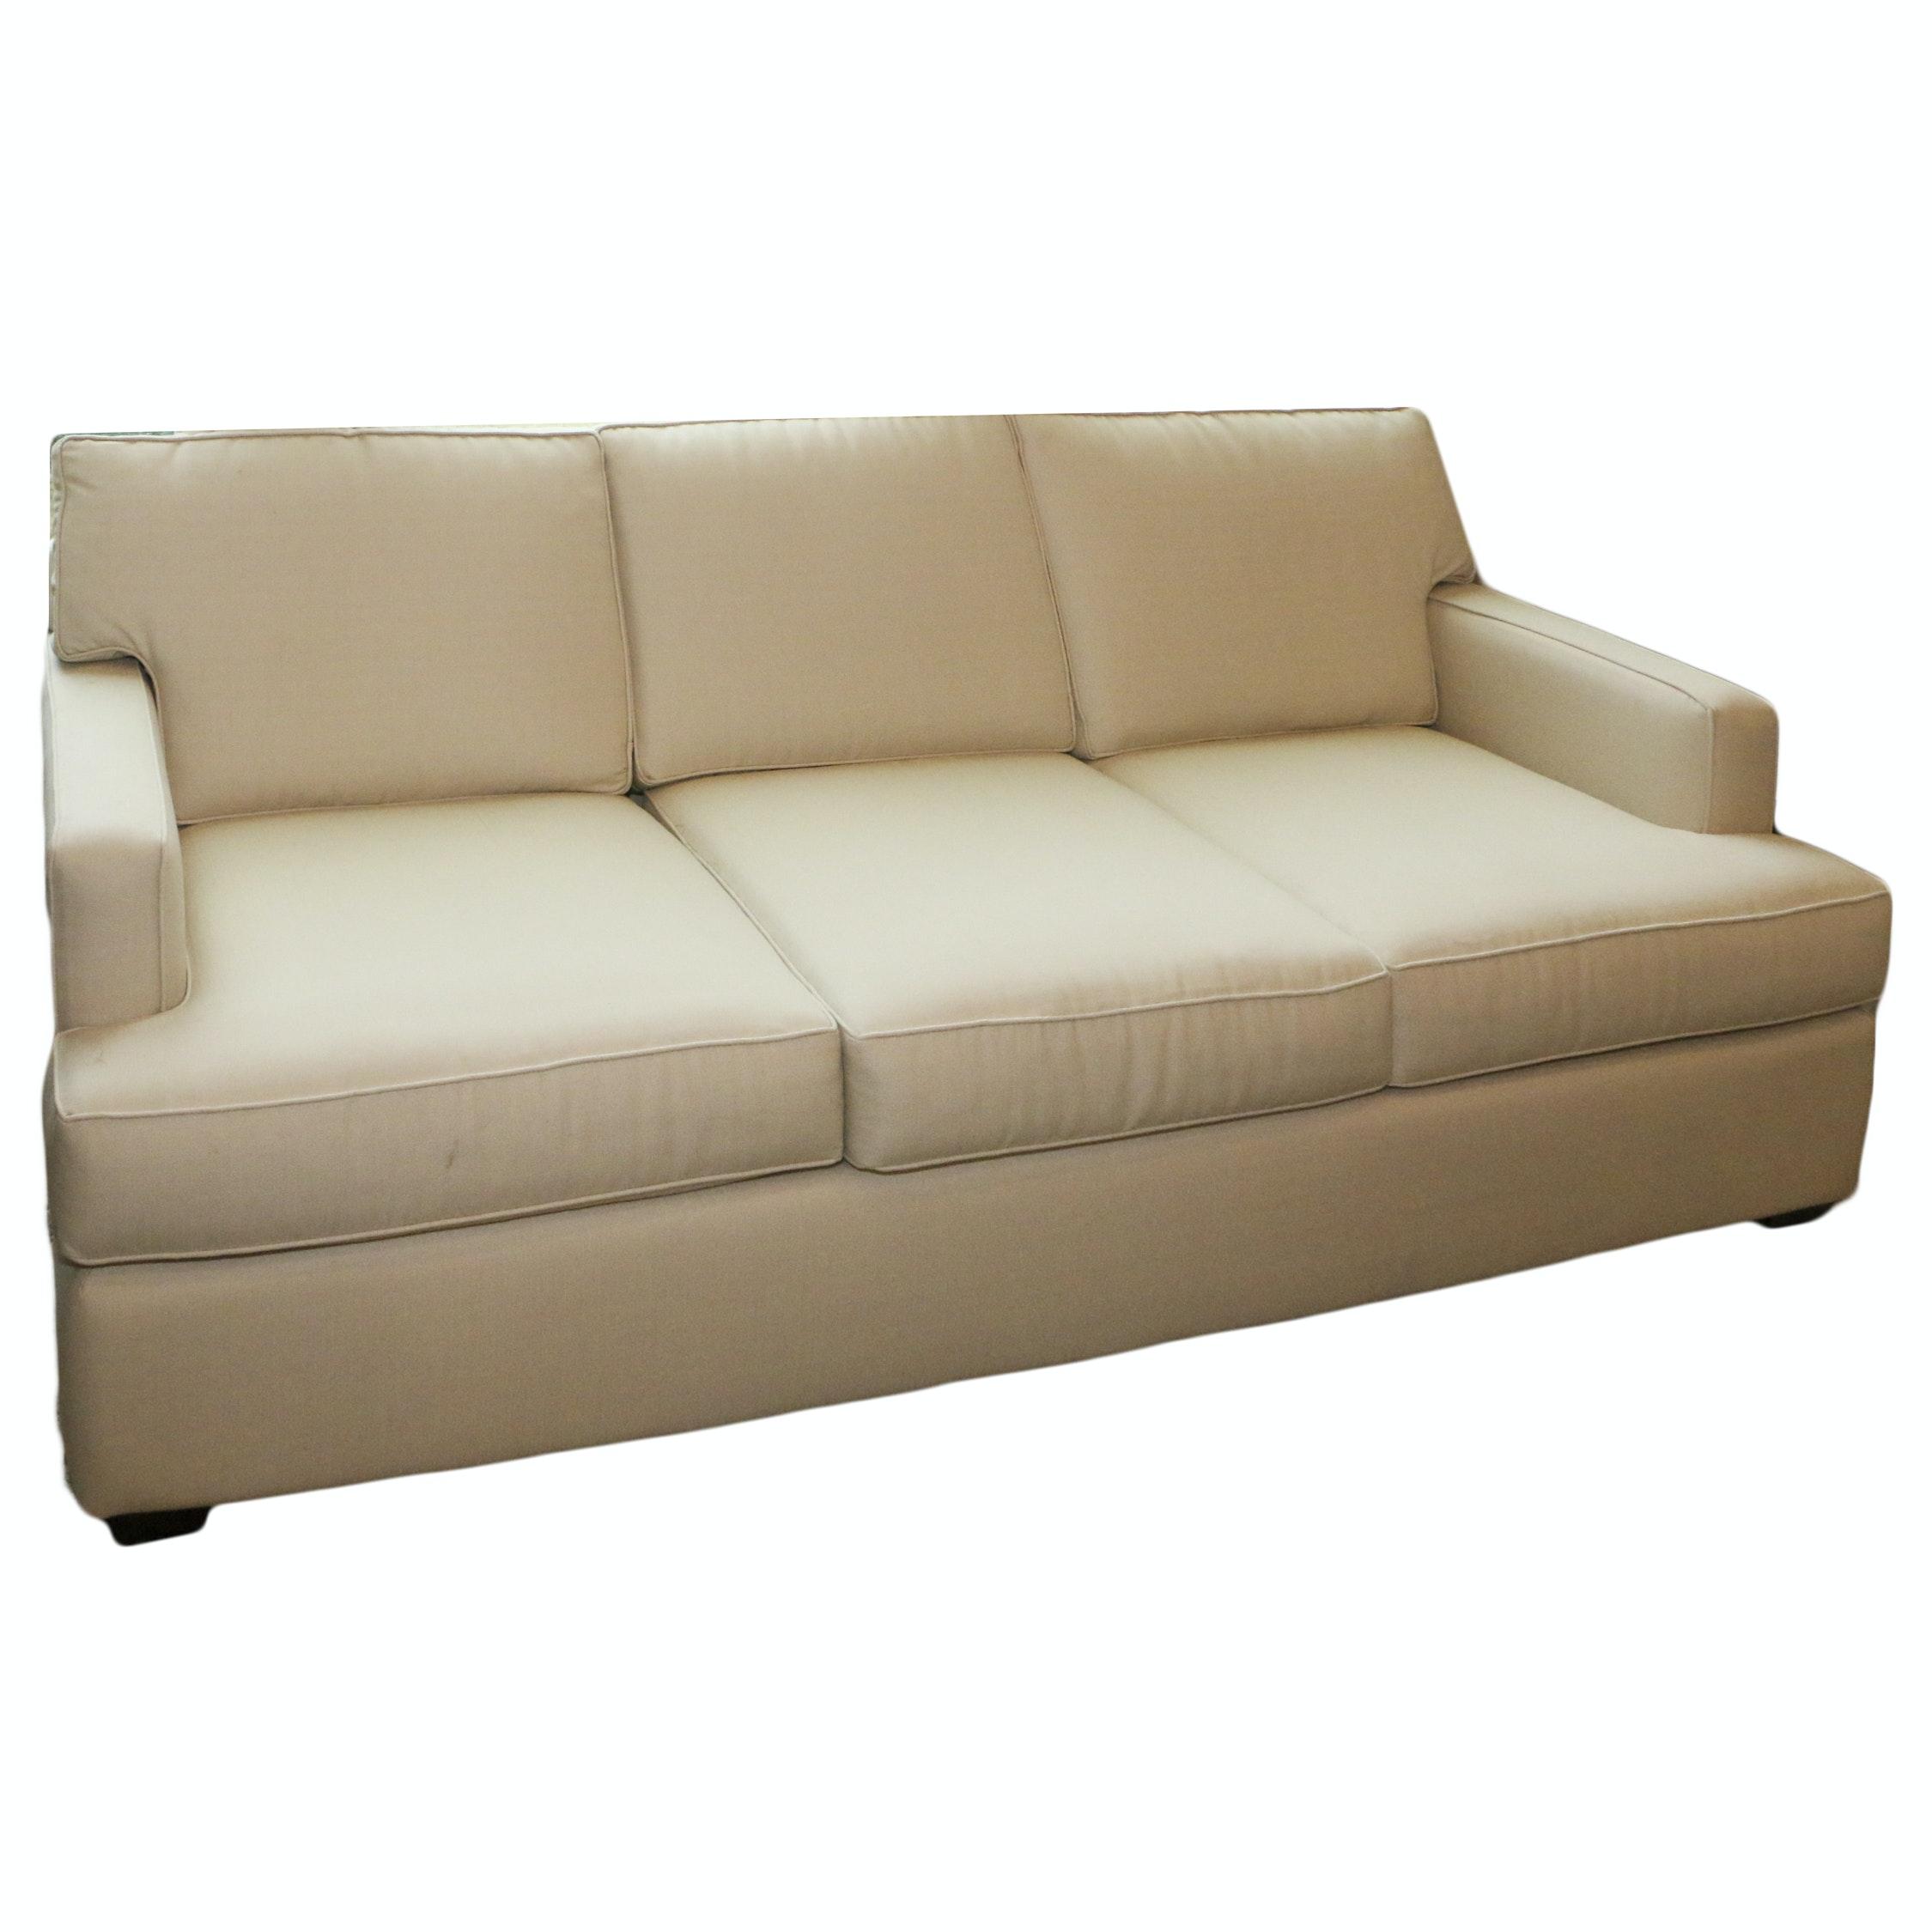 Upholstered Sofa, 21st Century